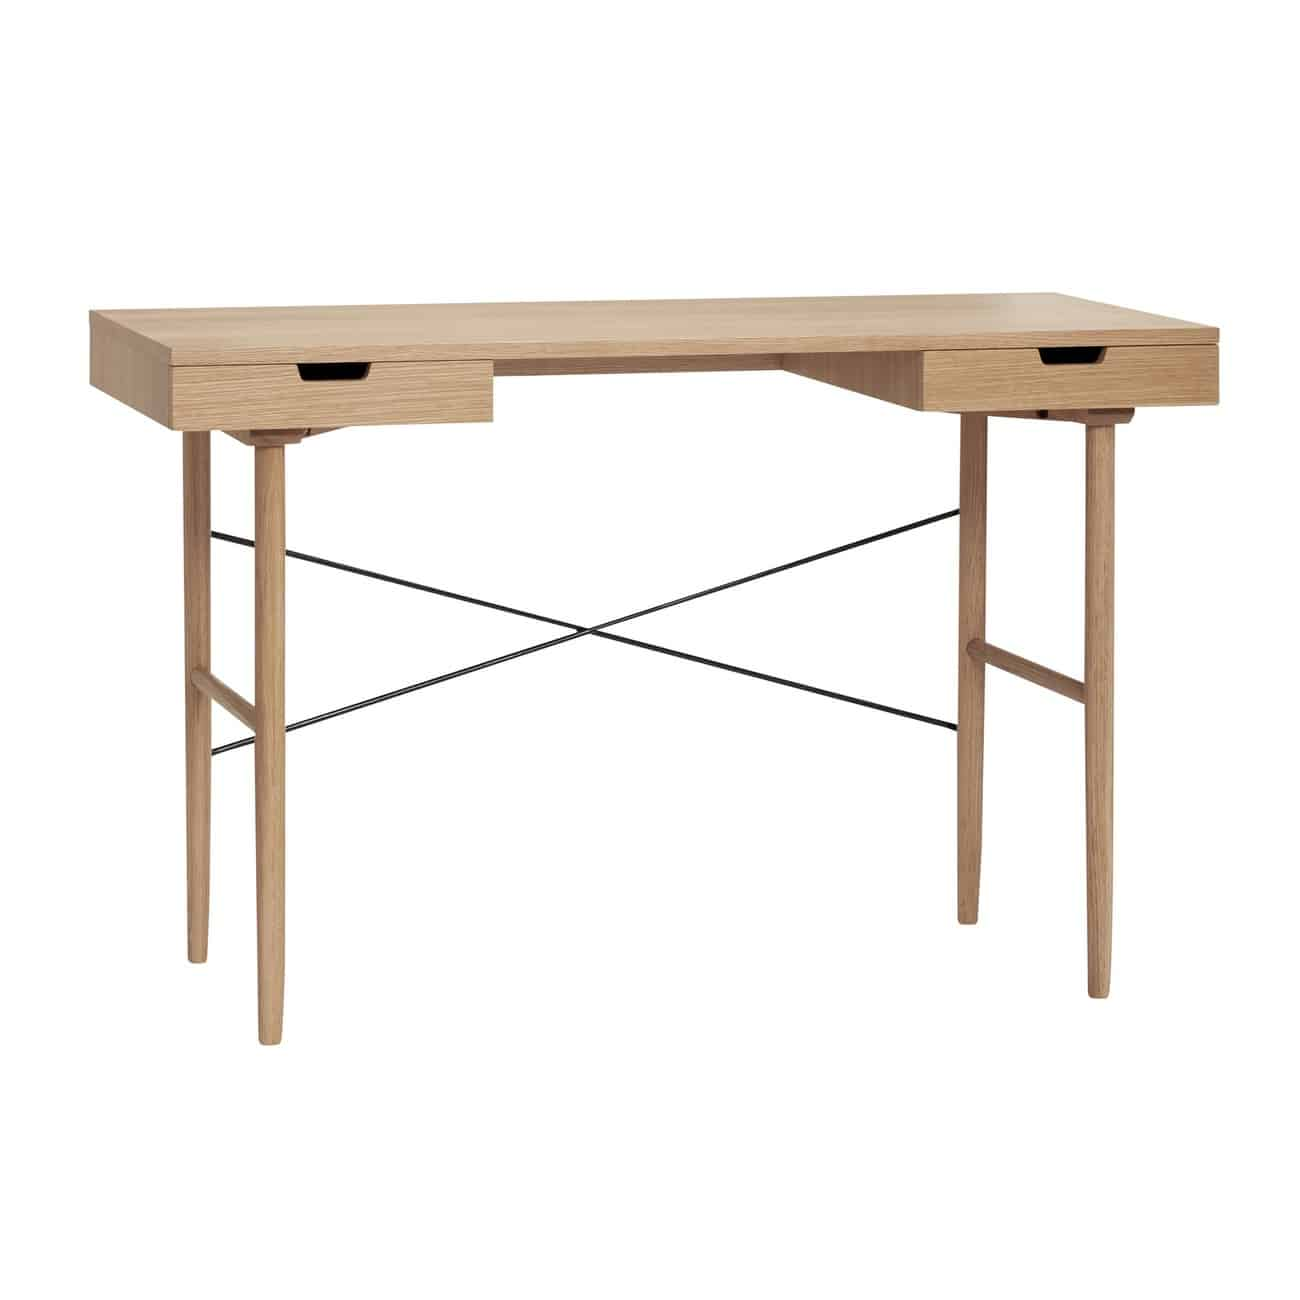 Skrivbord | Sida 2 | Byggahus.se